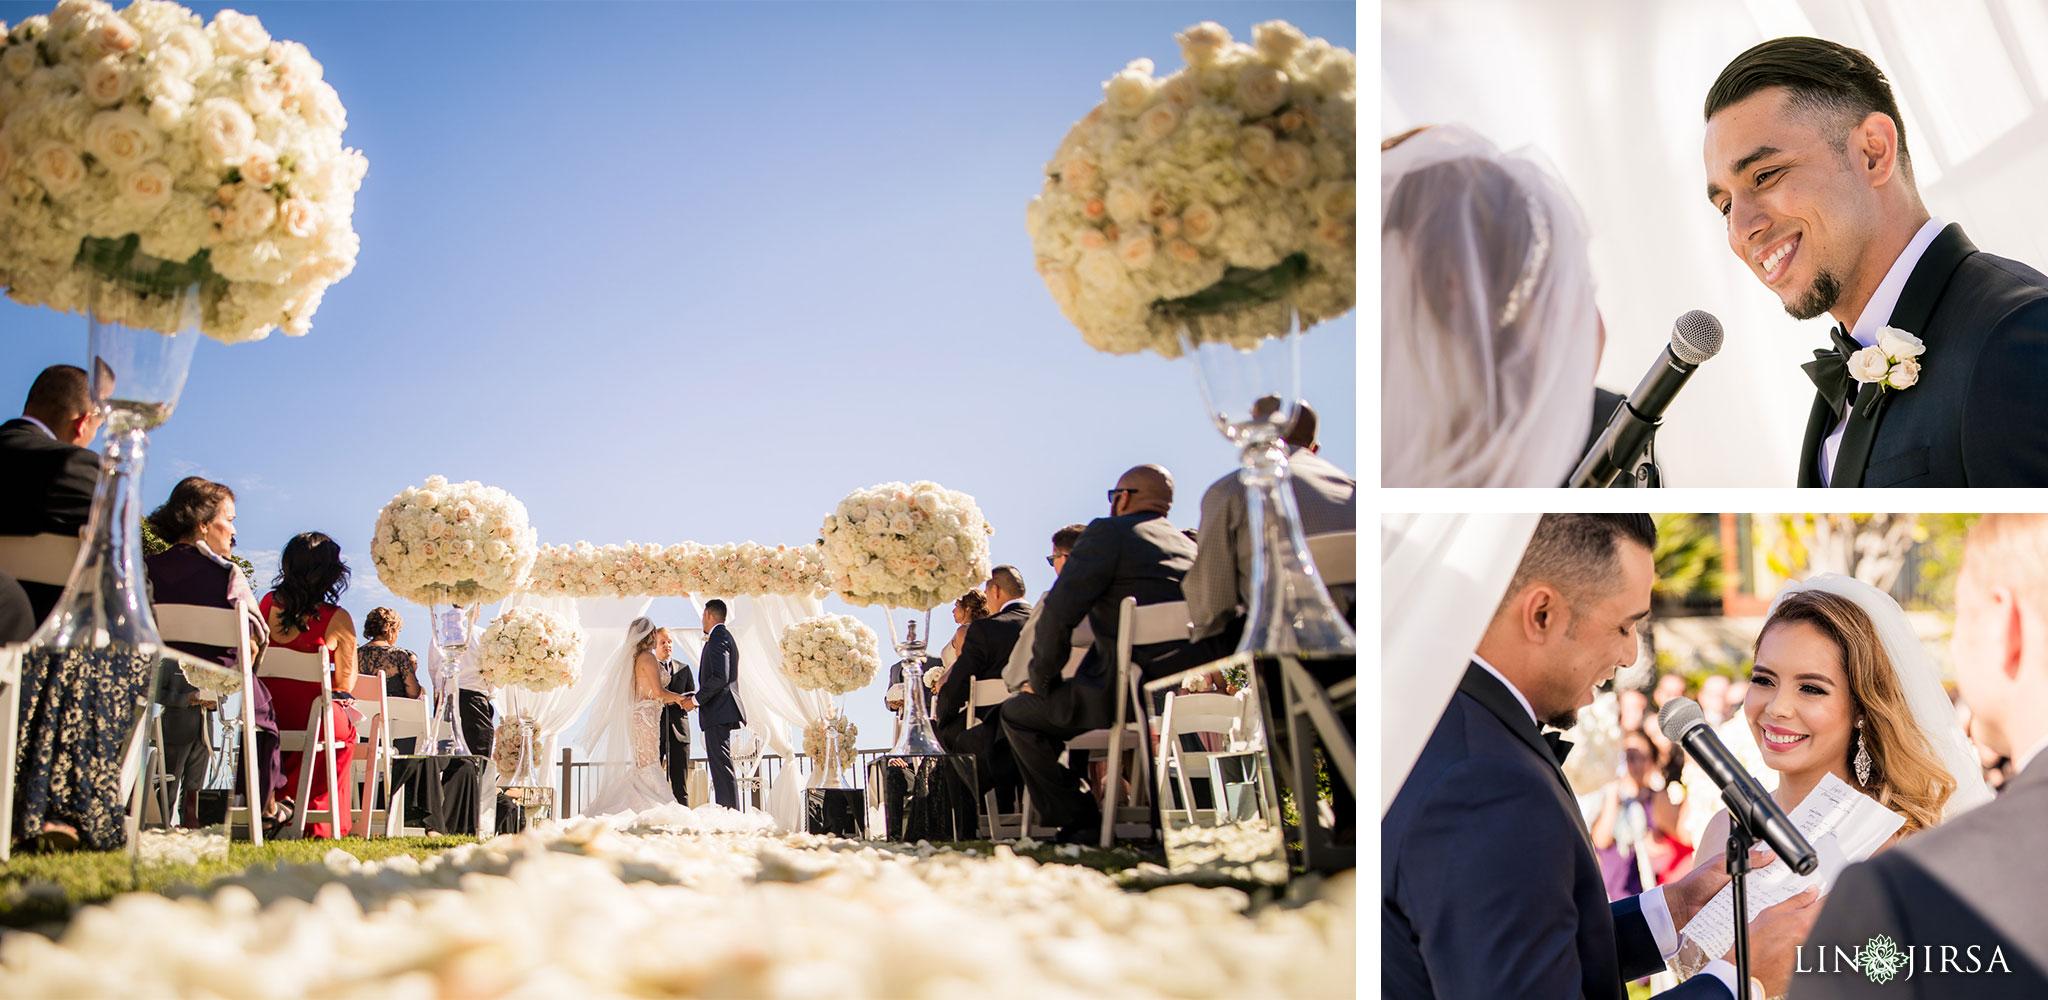 15 trump national golf club palos verdes wedding ceremony photography